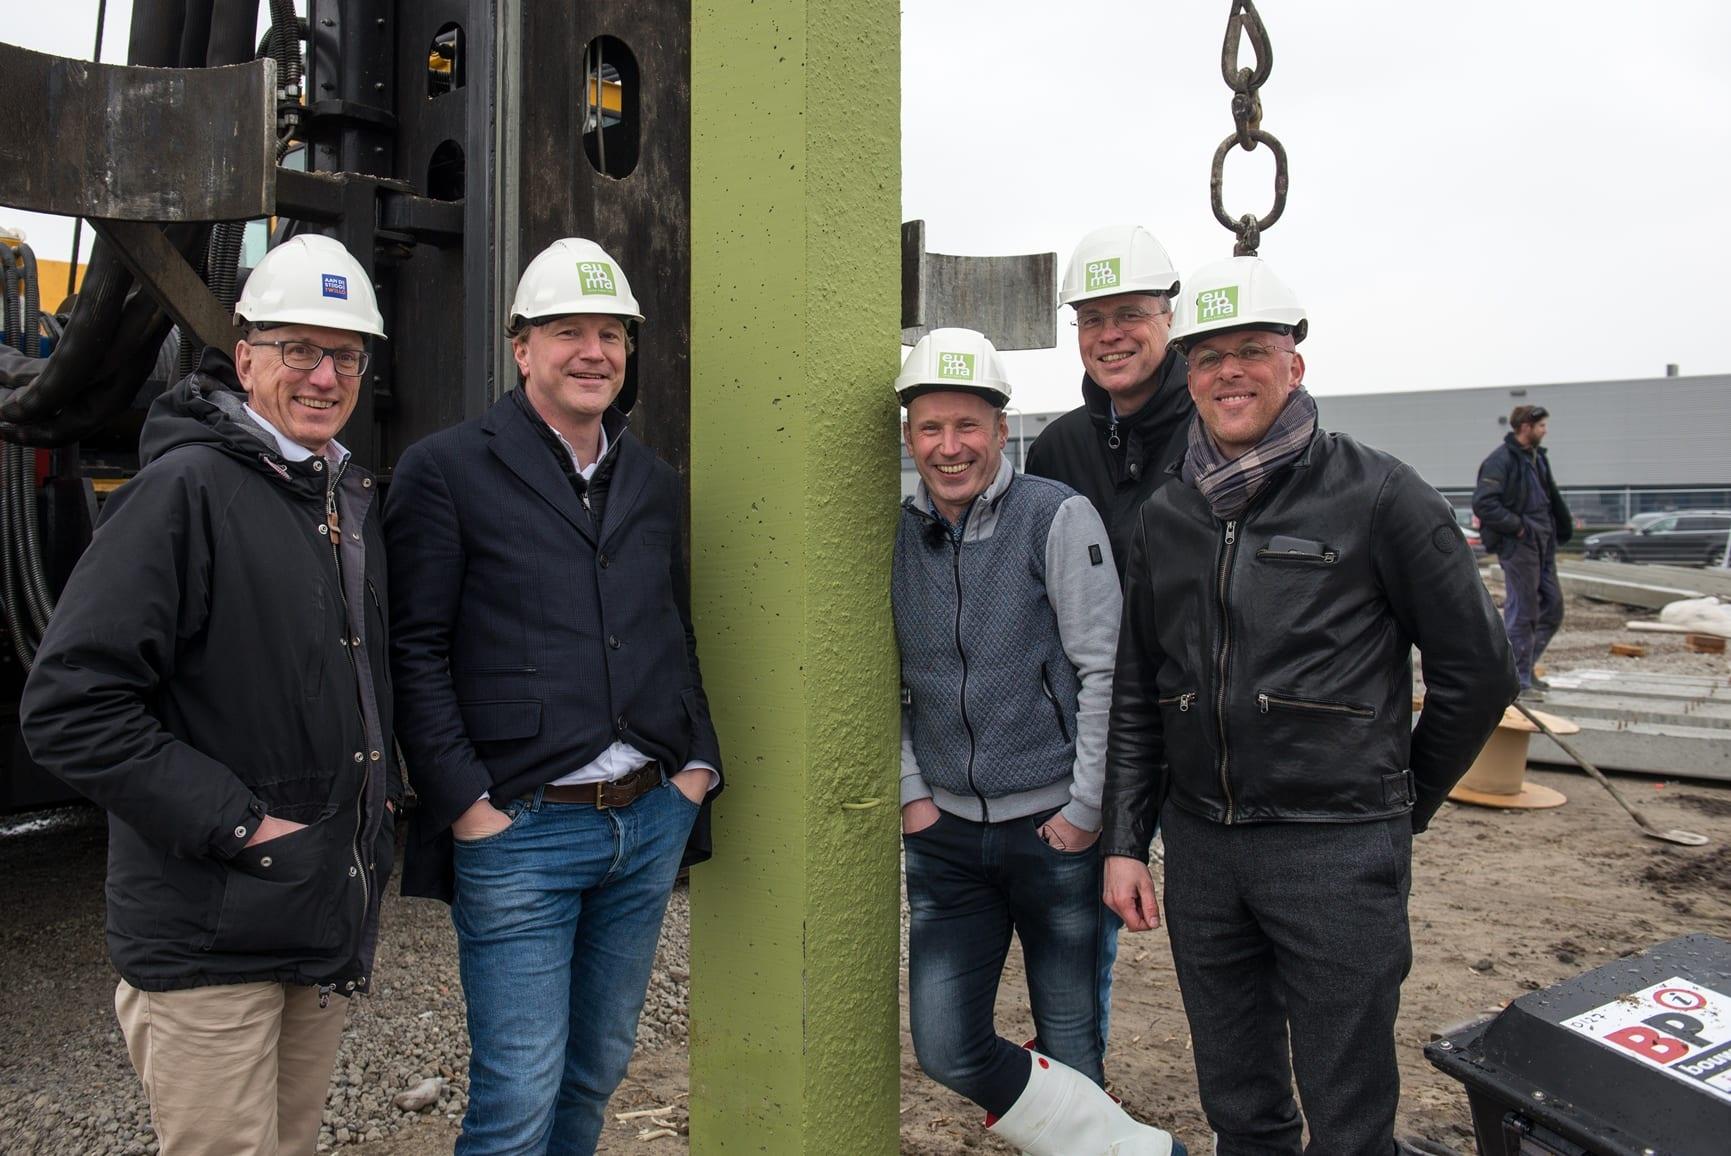 Nieuwbouw bedrijfspand Euroma Zwolle - feestelijke paal